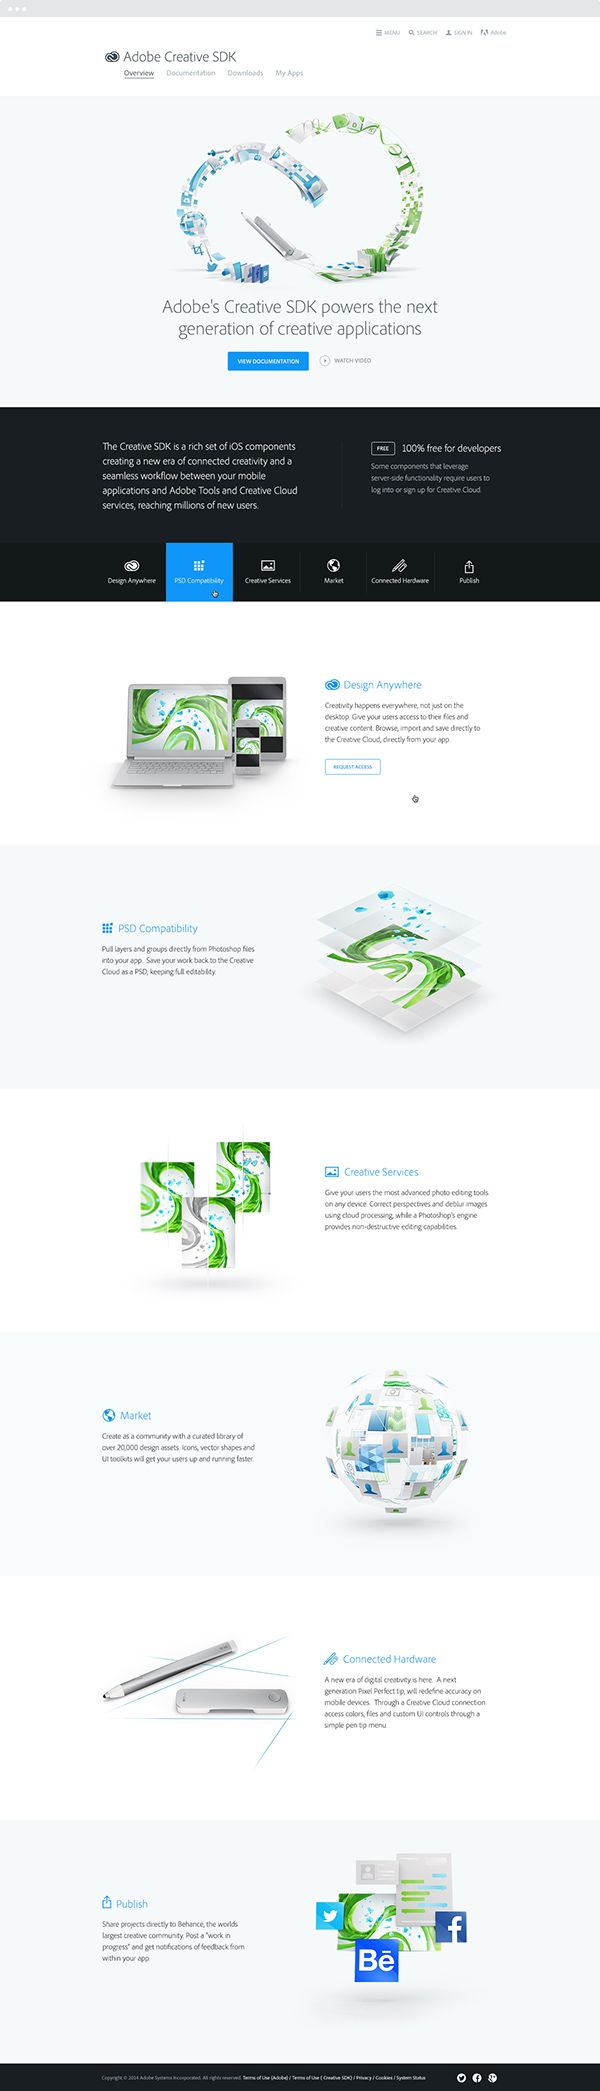 Adobe Creative SDK Website